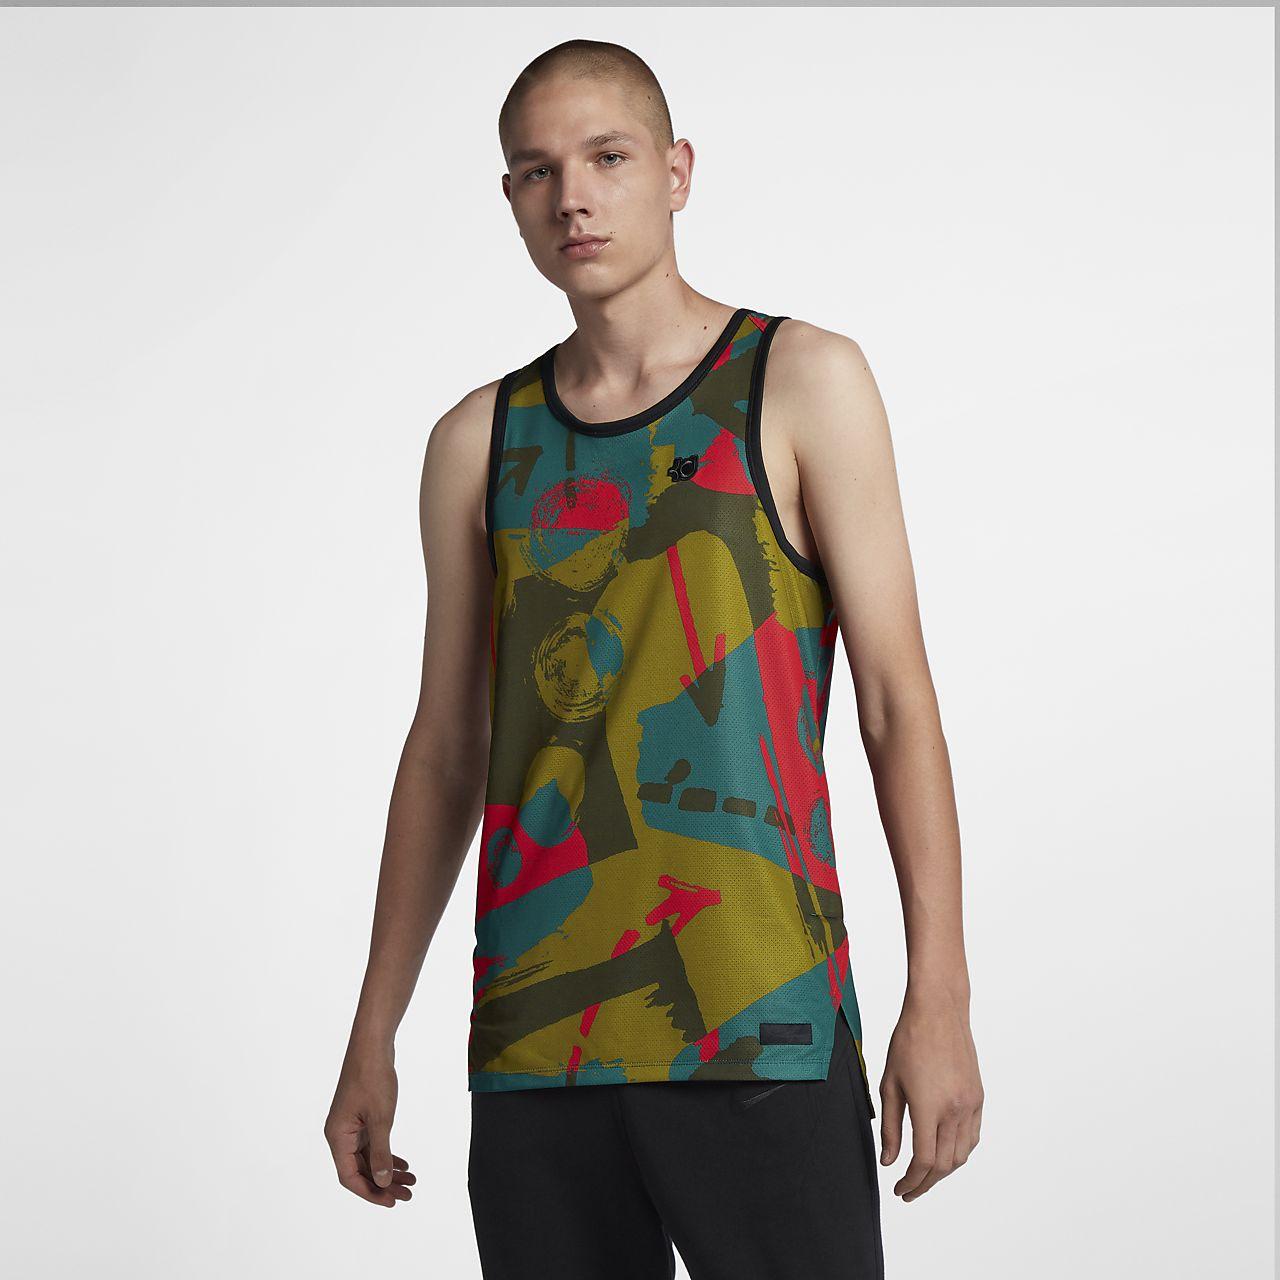 Pánské basketbalové tílko Nike KD Hyper Elite